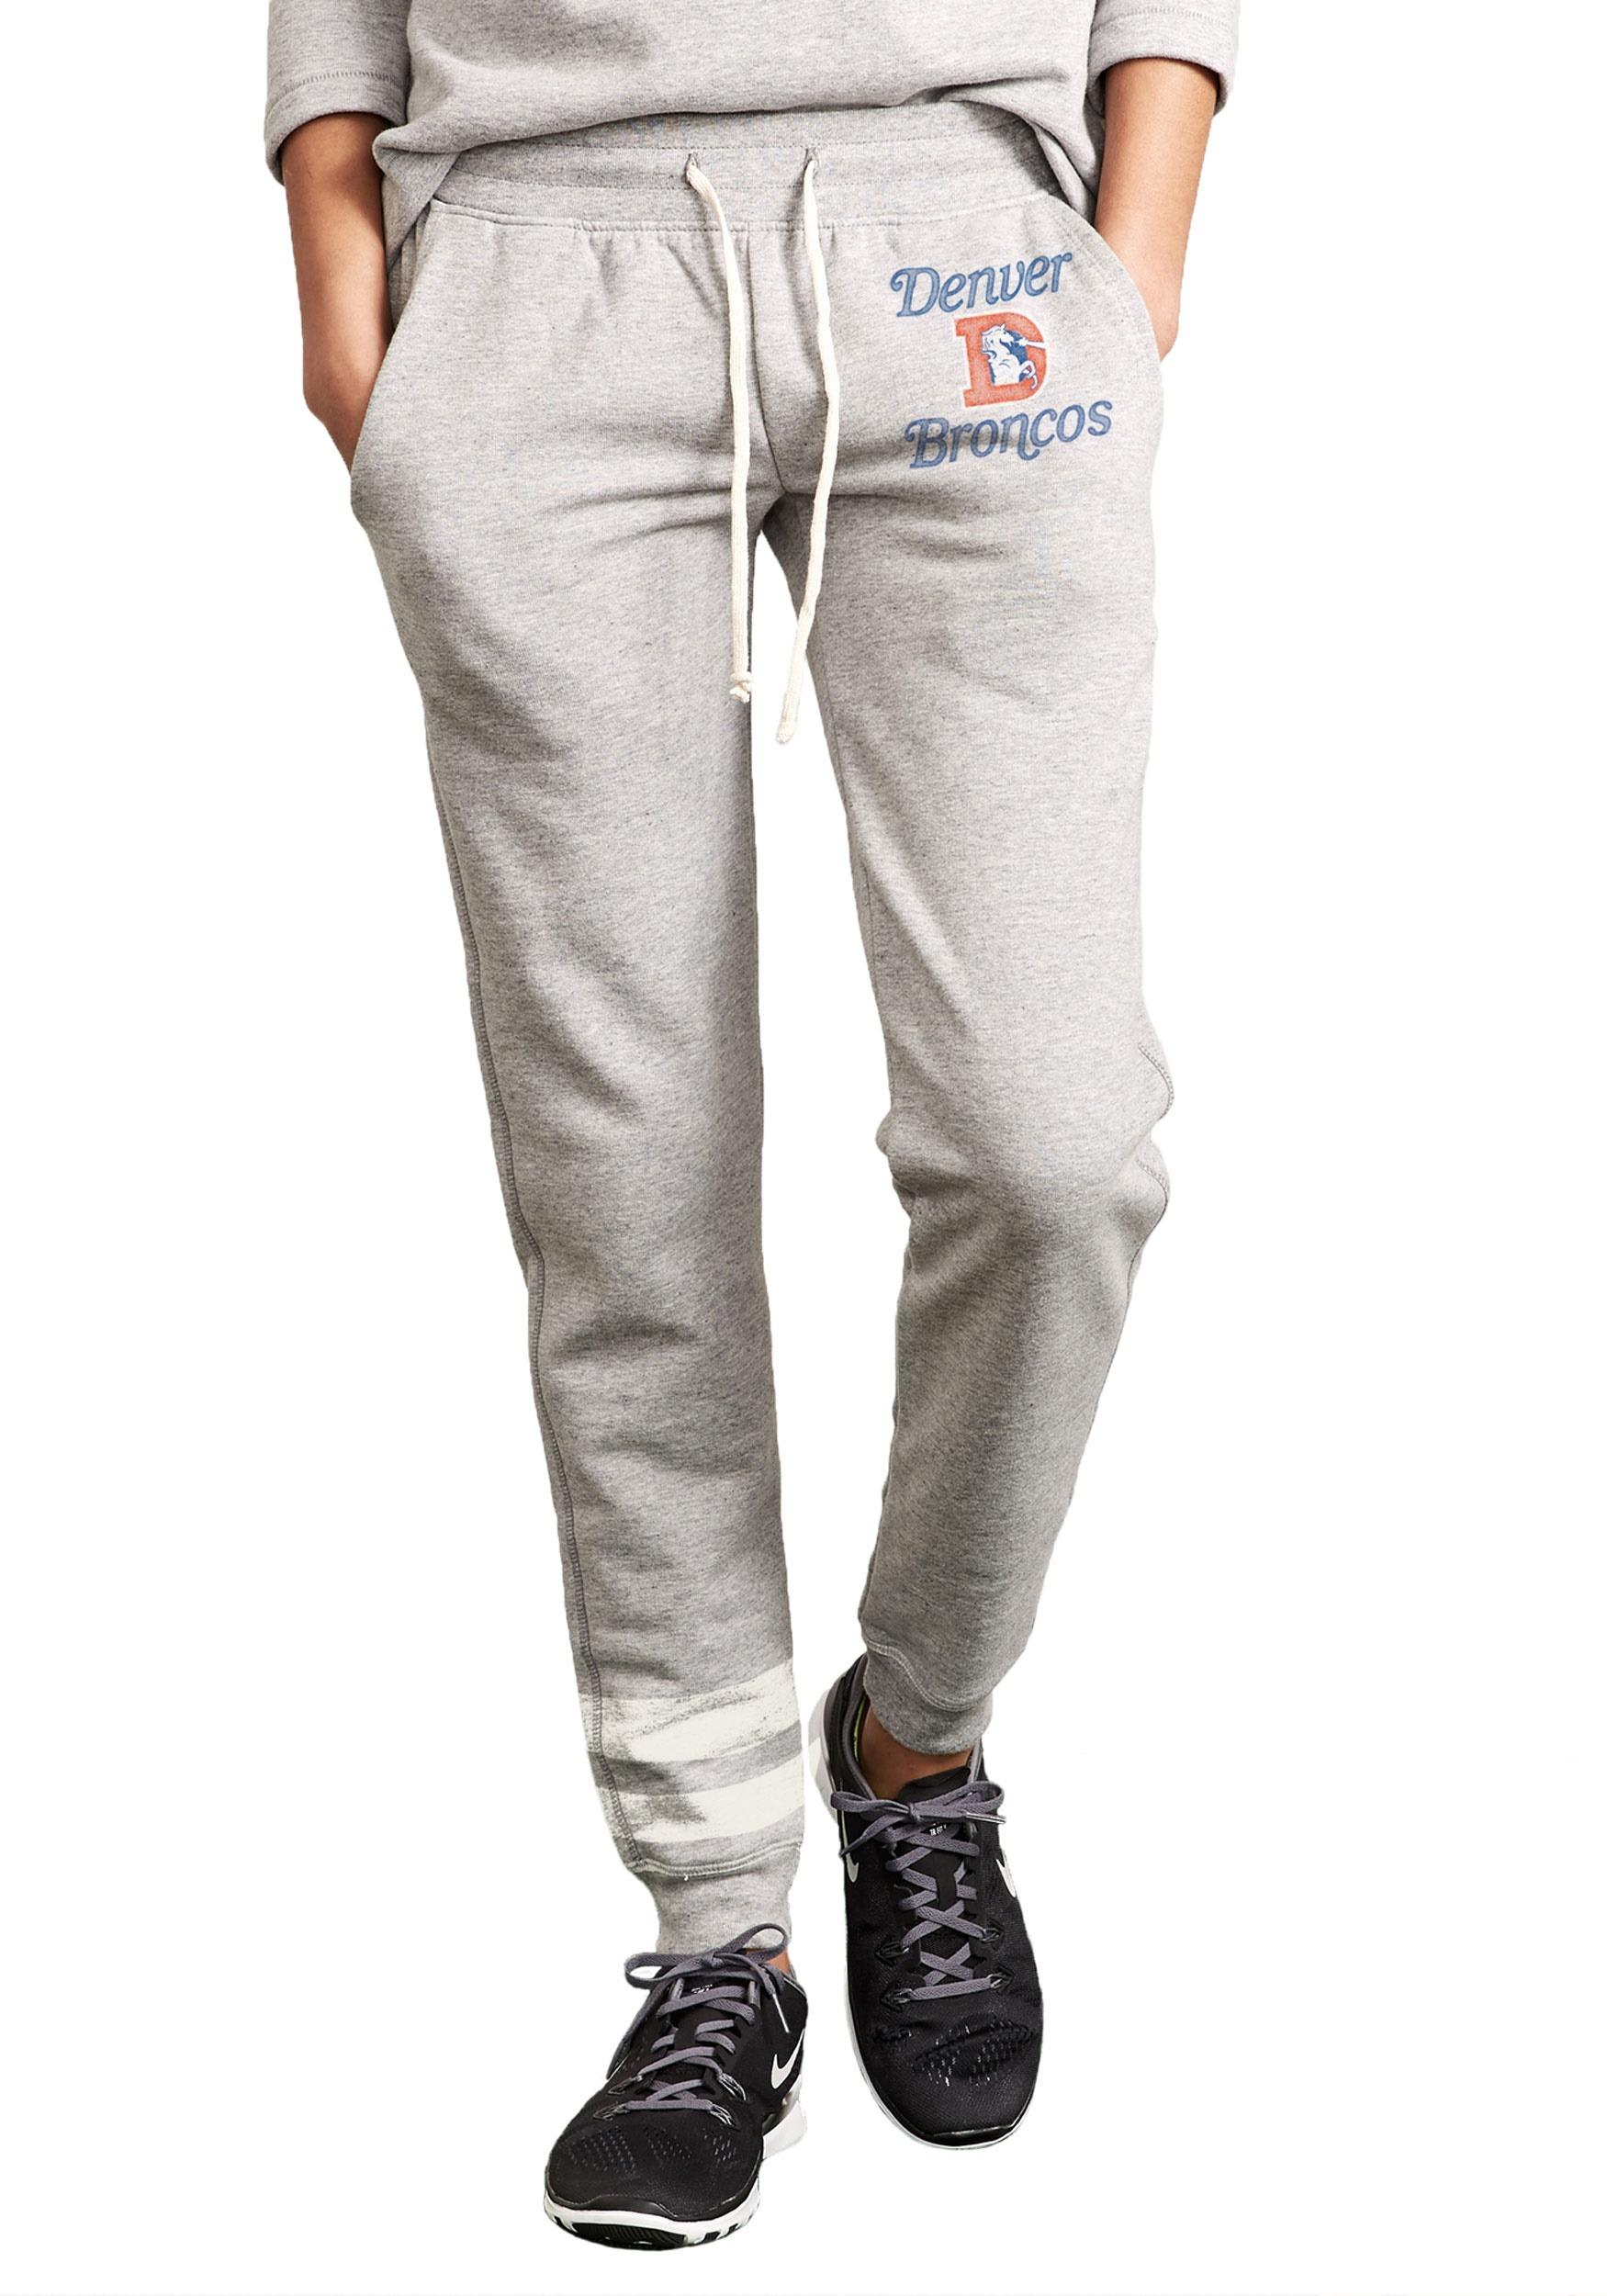 Denver Broncos Sunday Sweat Pants for Women